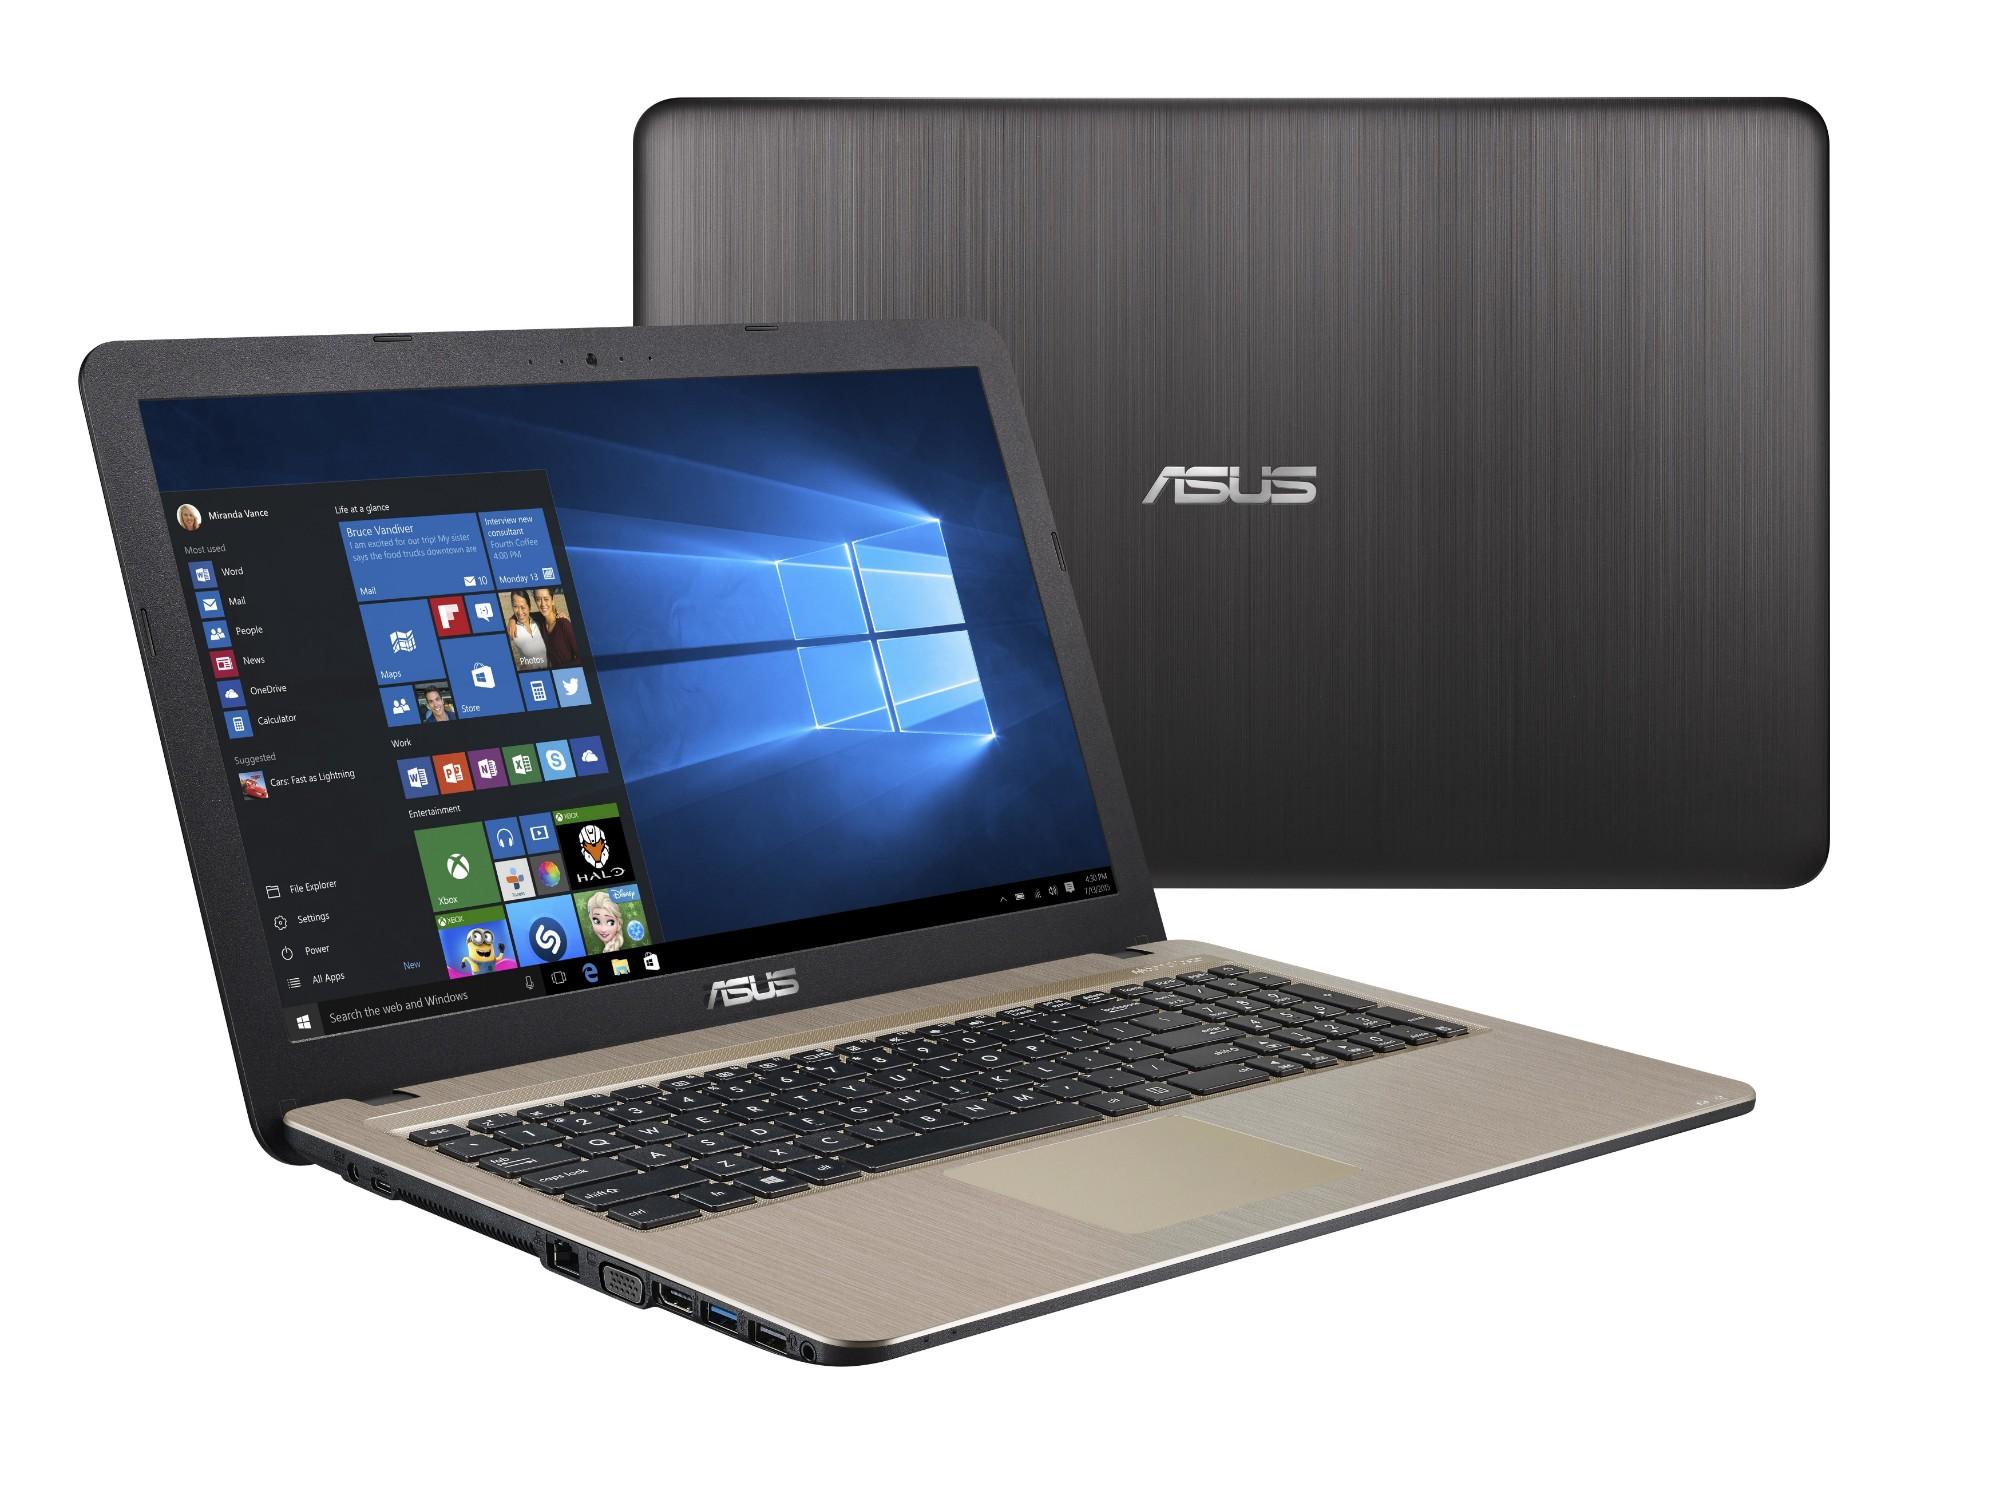 "ASUS VivoBook X540LA-XX194T 2.4GHz i7-5500U 15.6"" 1366 x 768pixels Black,Brown Notebook"